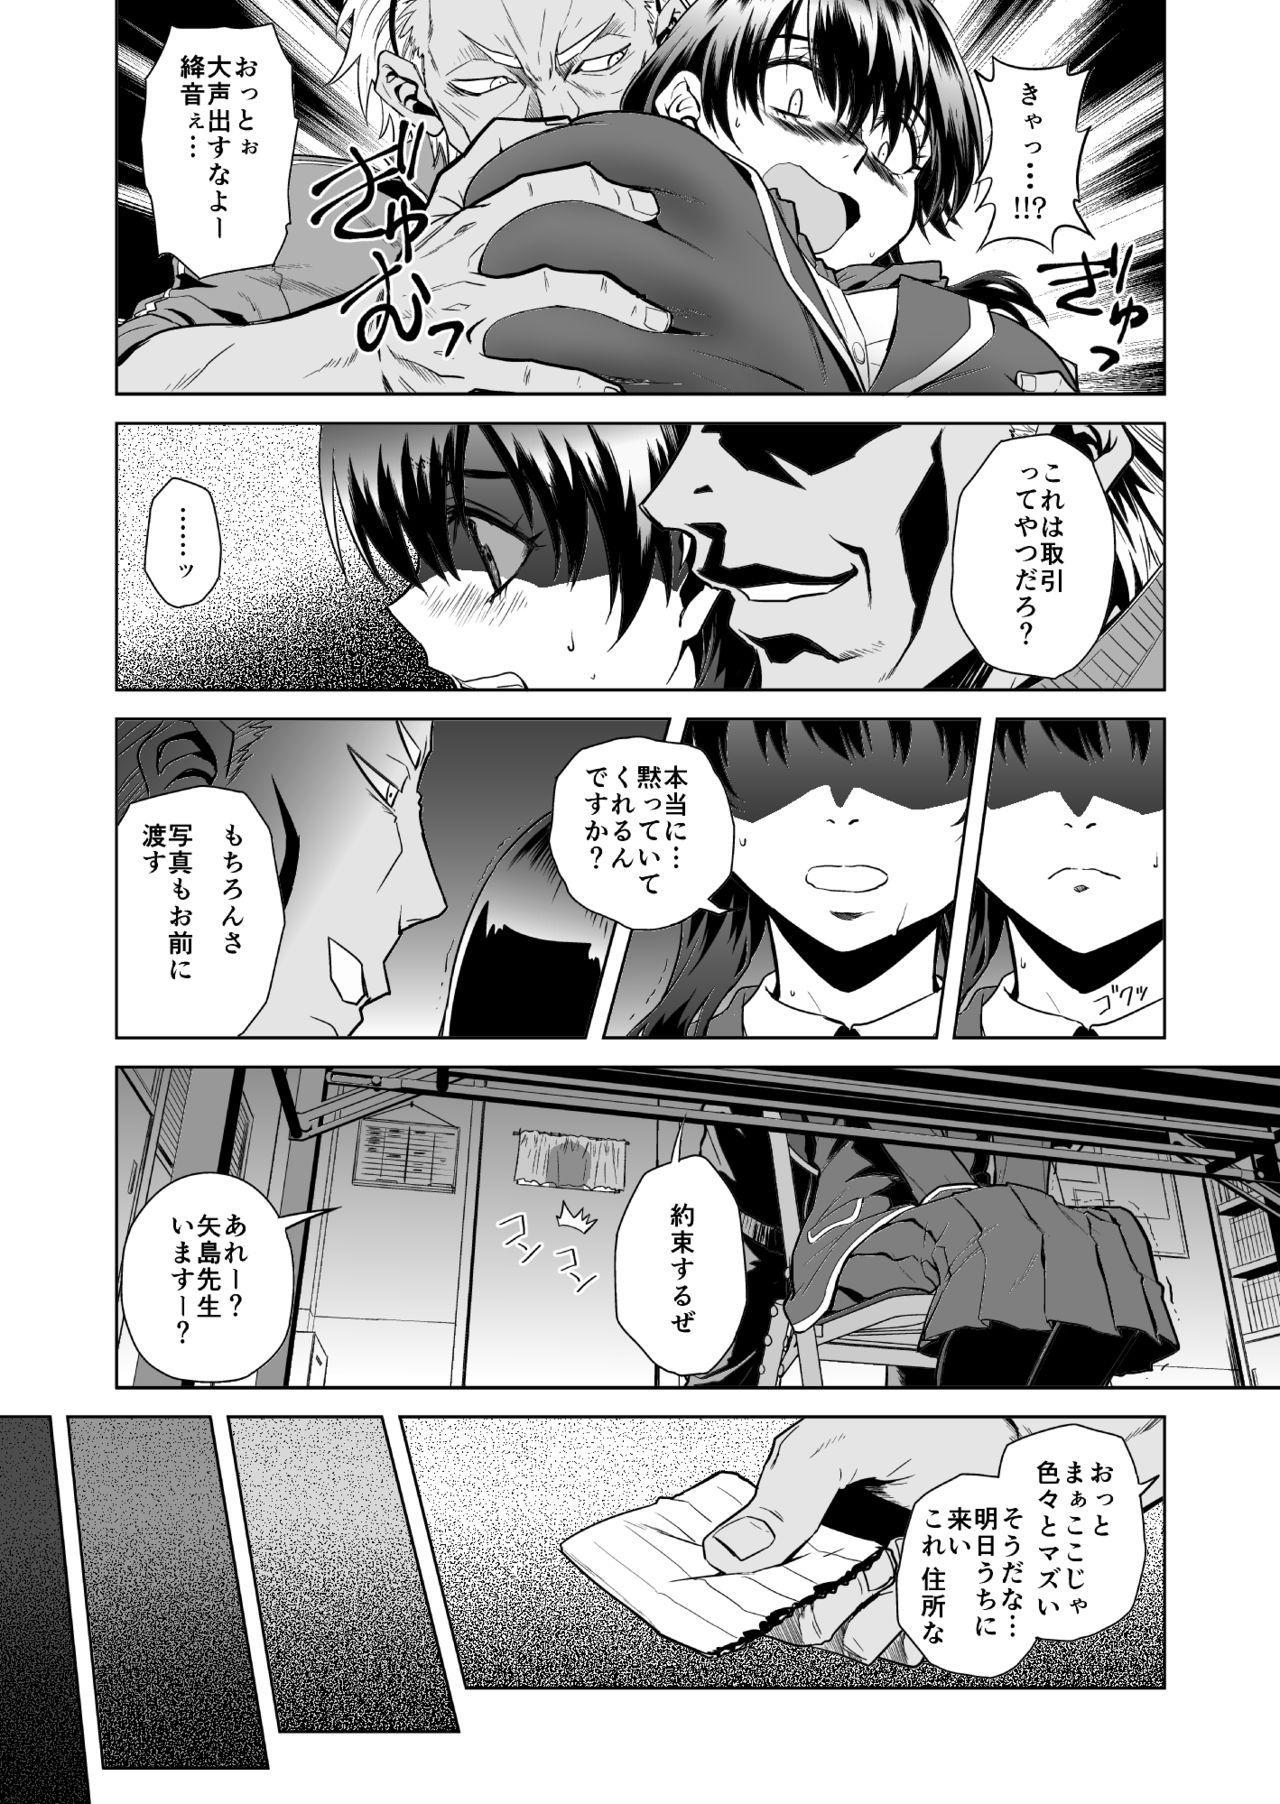 Akaneiro no Joukei 10